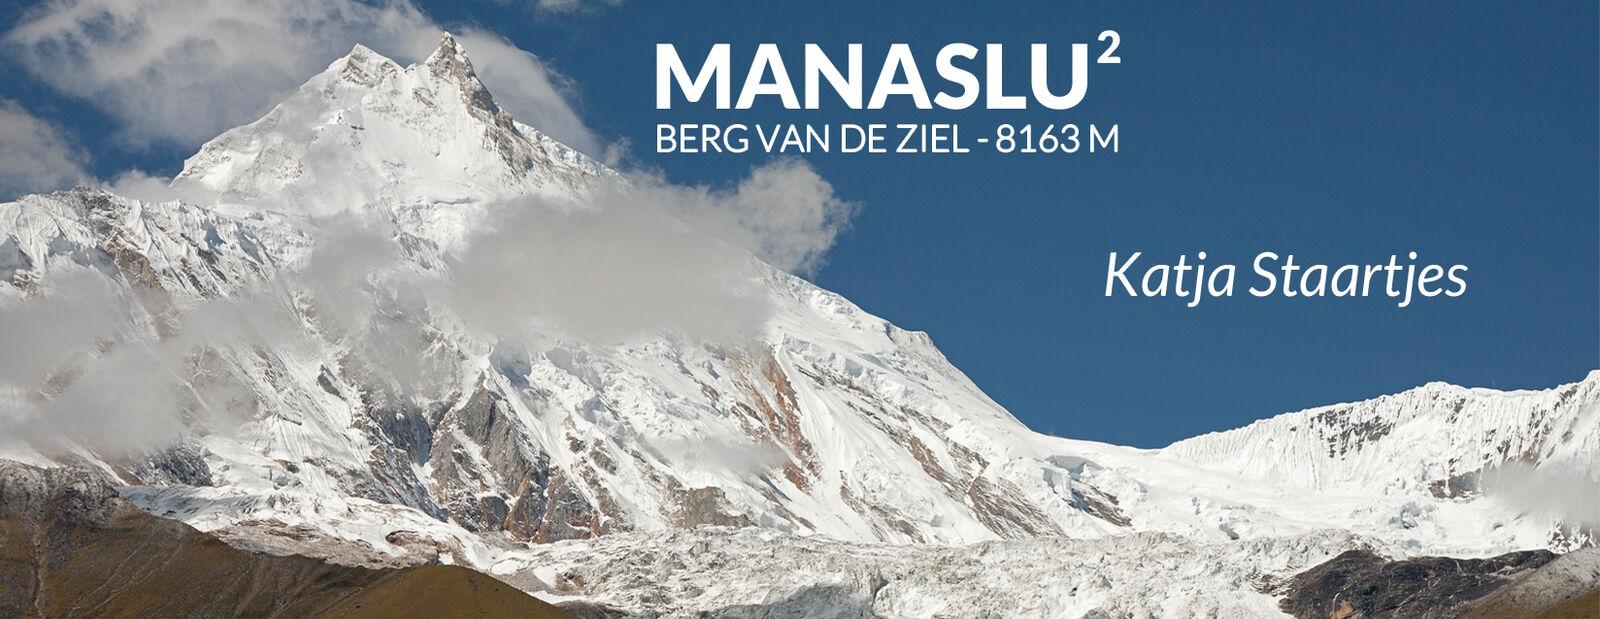 Live multimedia theatershow 'Manaslu2'